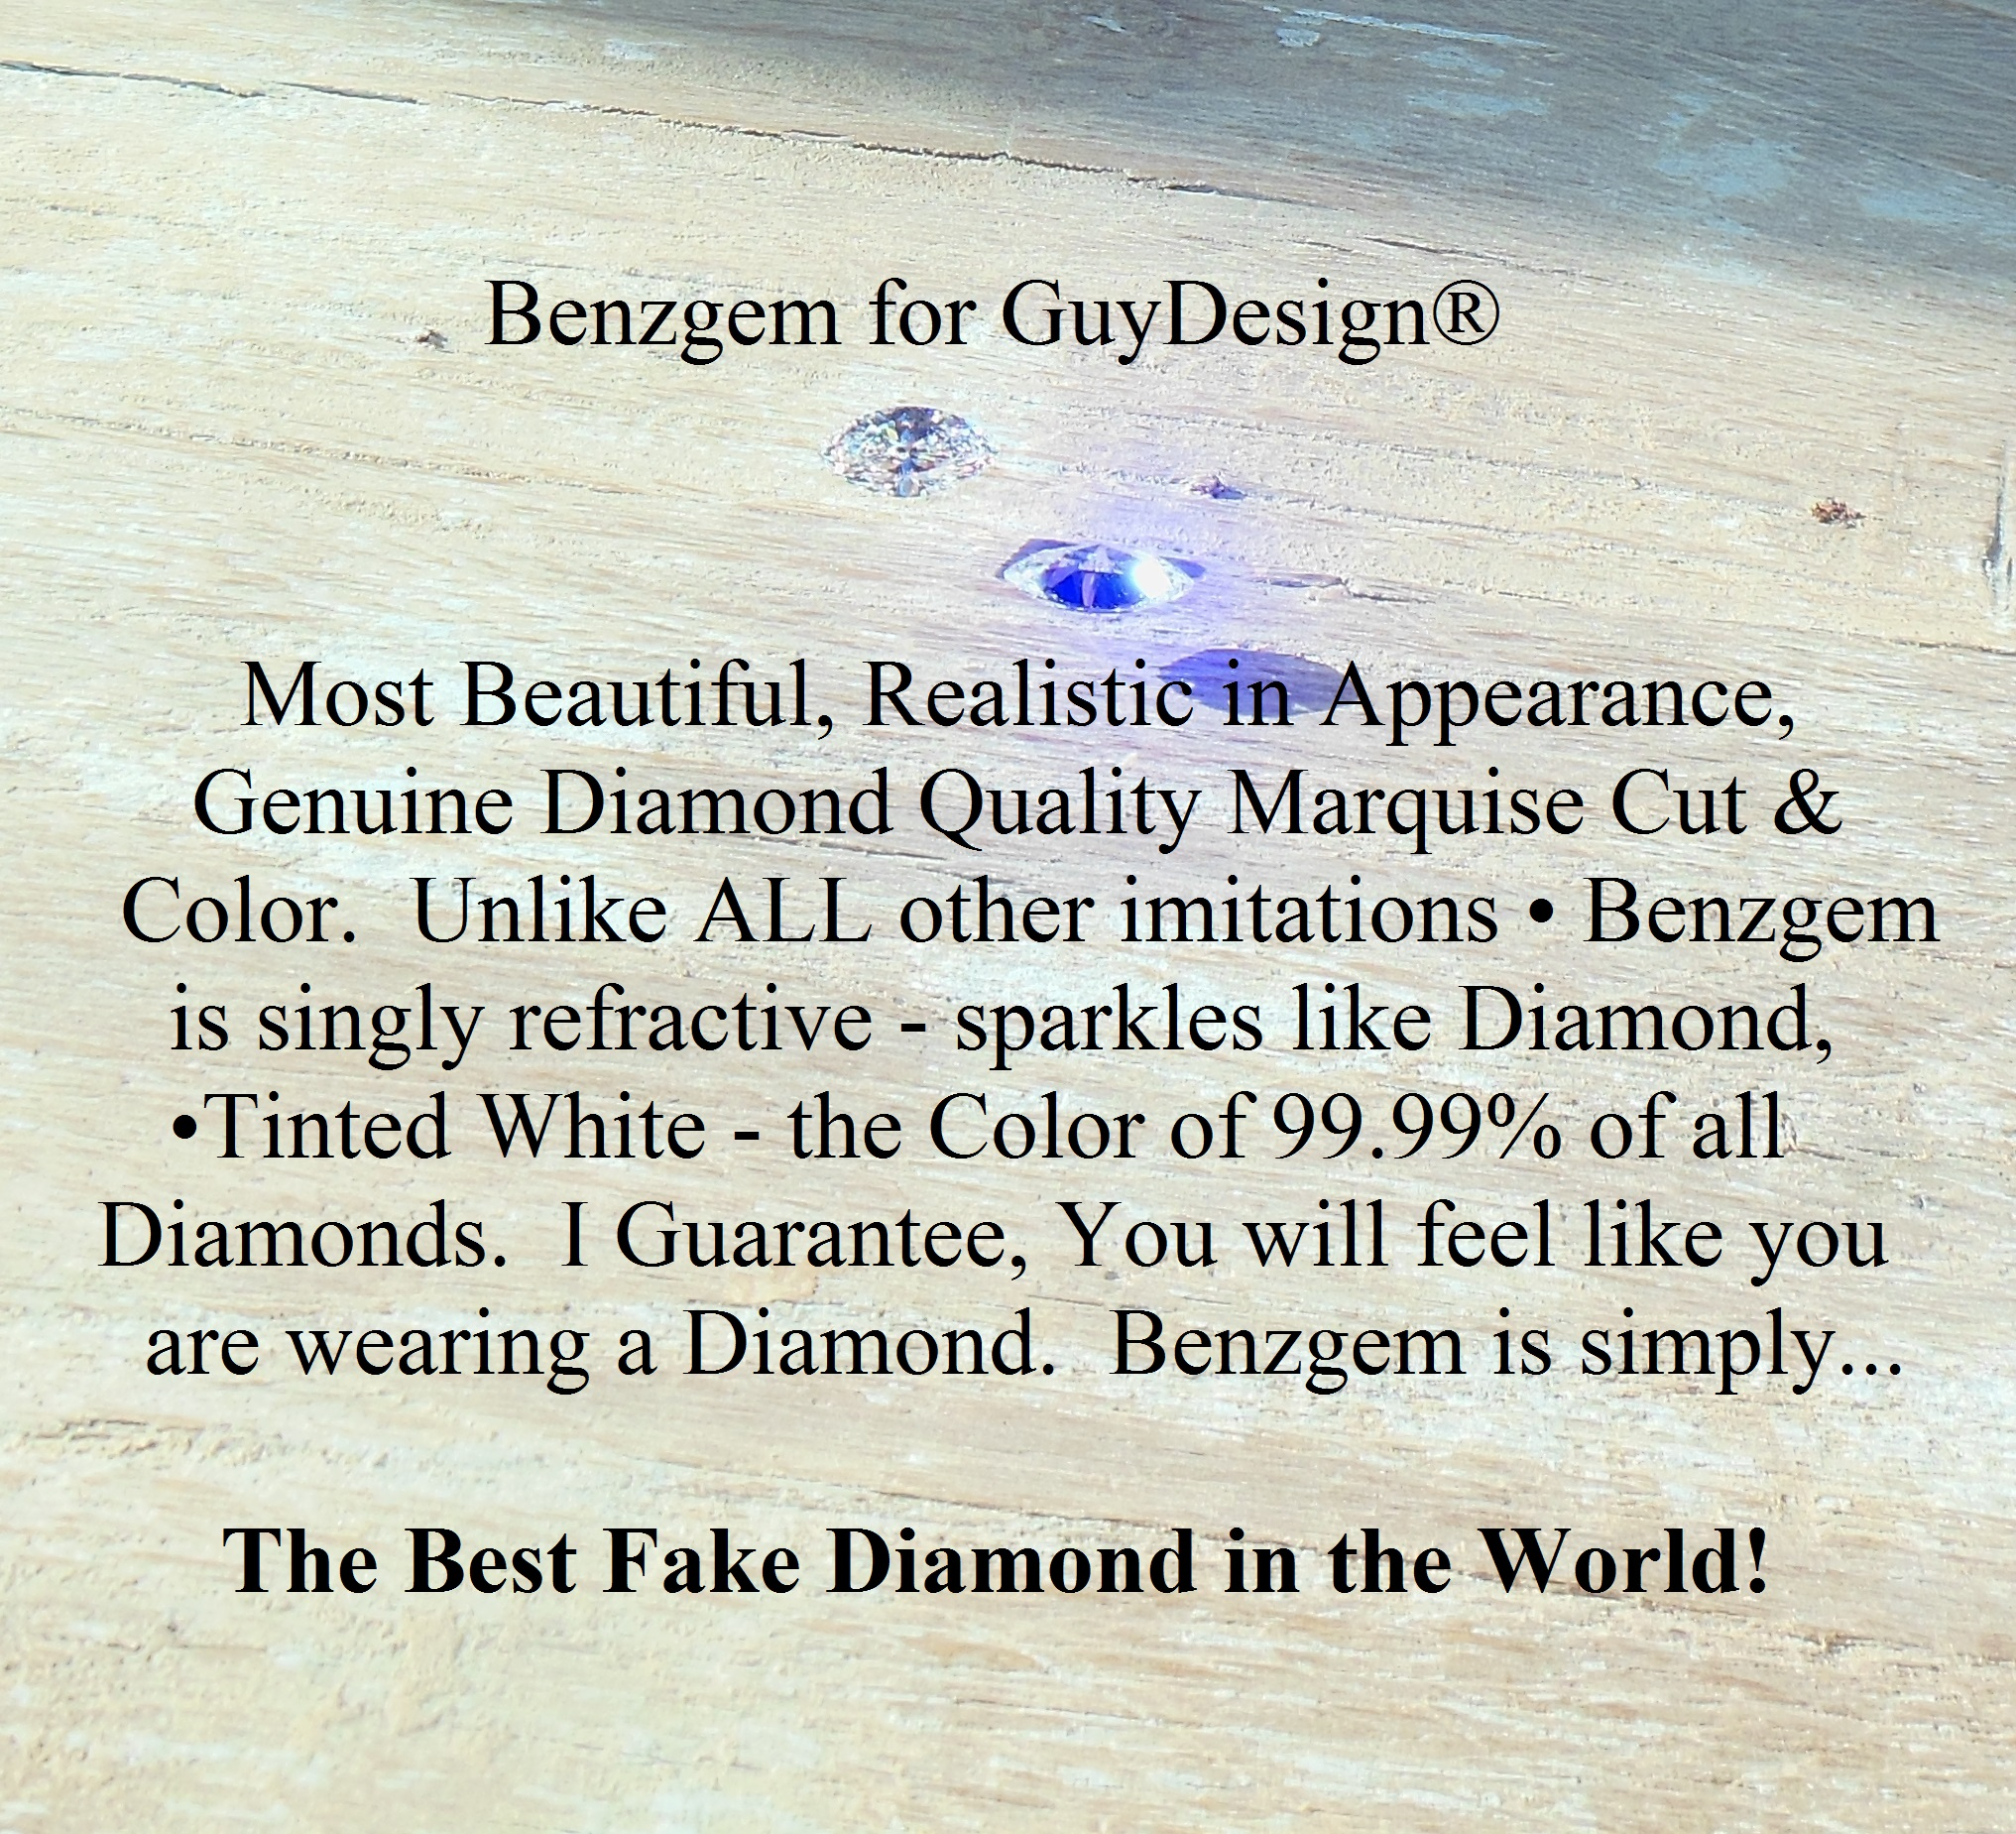 benzgem-for-guydesign-marquise-cut-best-fake-diamond-in-the-world.jpg